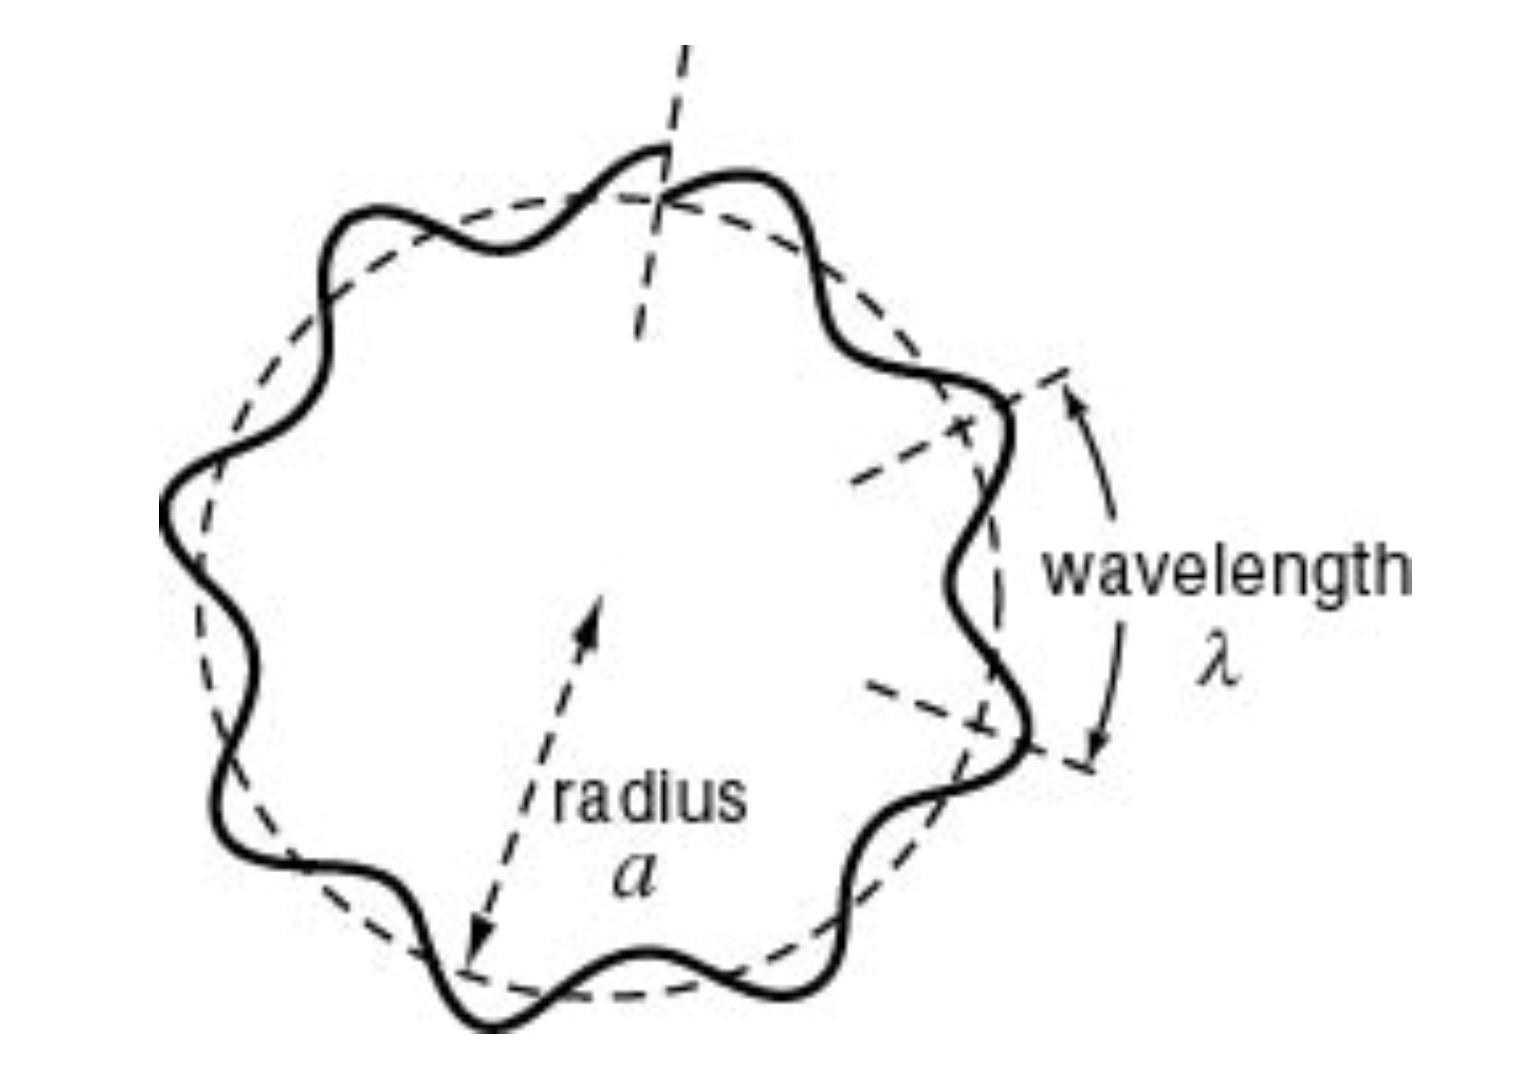 http://ne.phys.kyushu-u.ac.jp/seminar/MicroWorld1_E/Part4_E/P44_E/wave_character_of_electron_E.htm